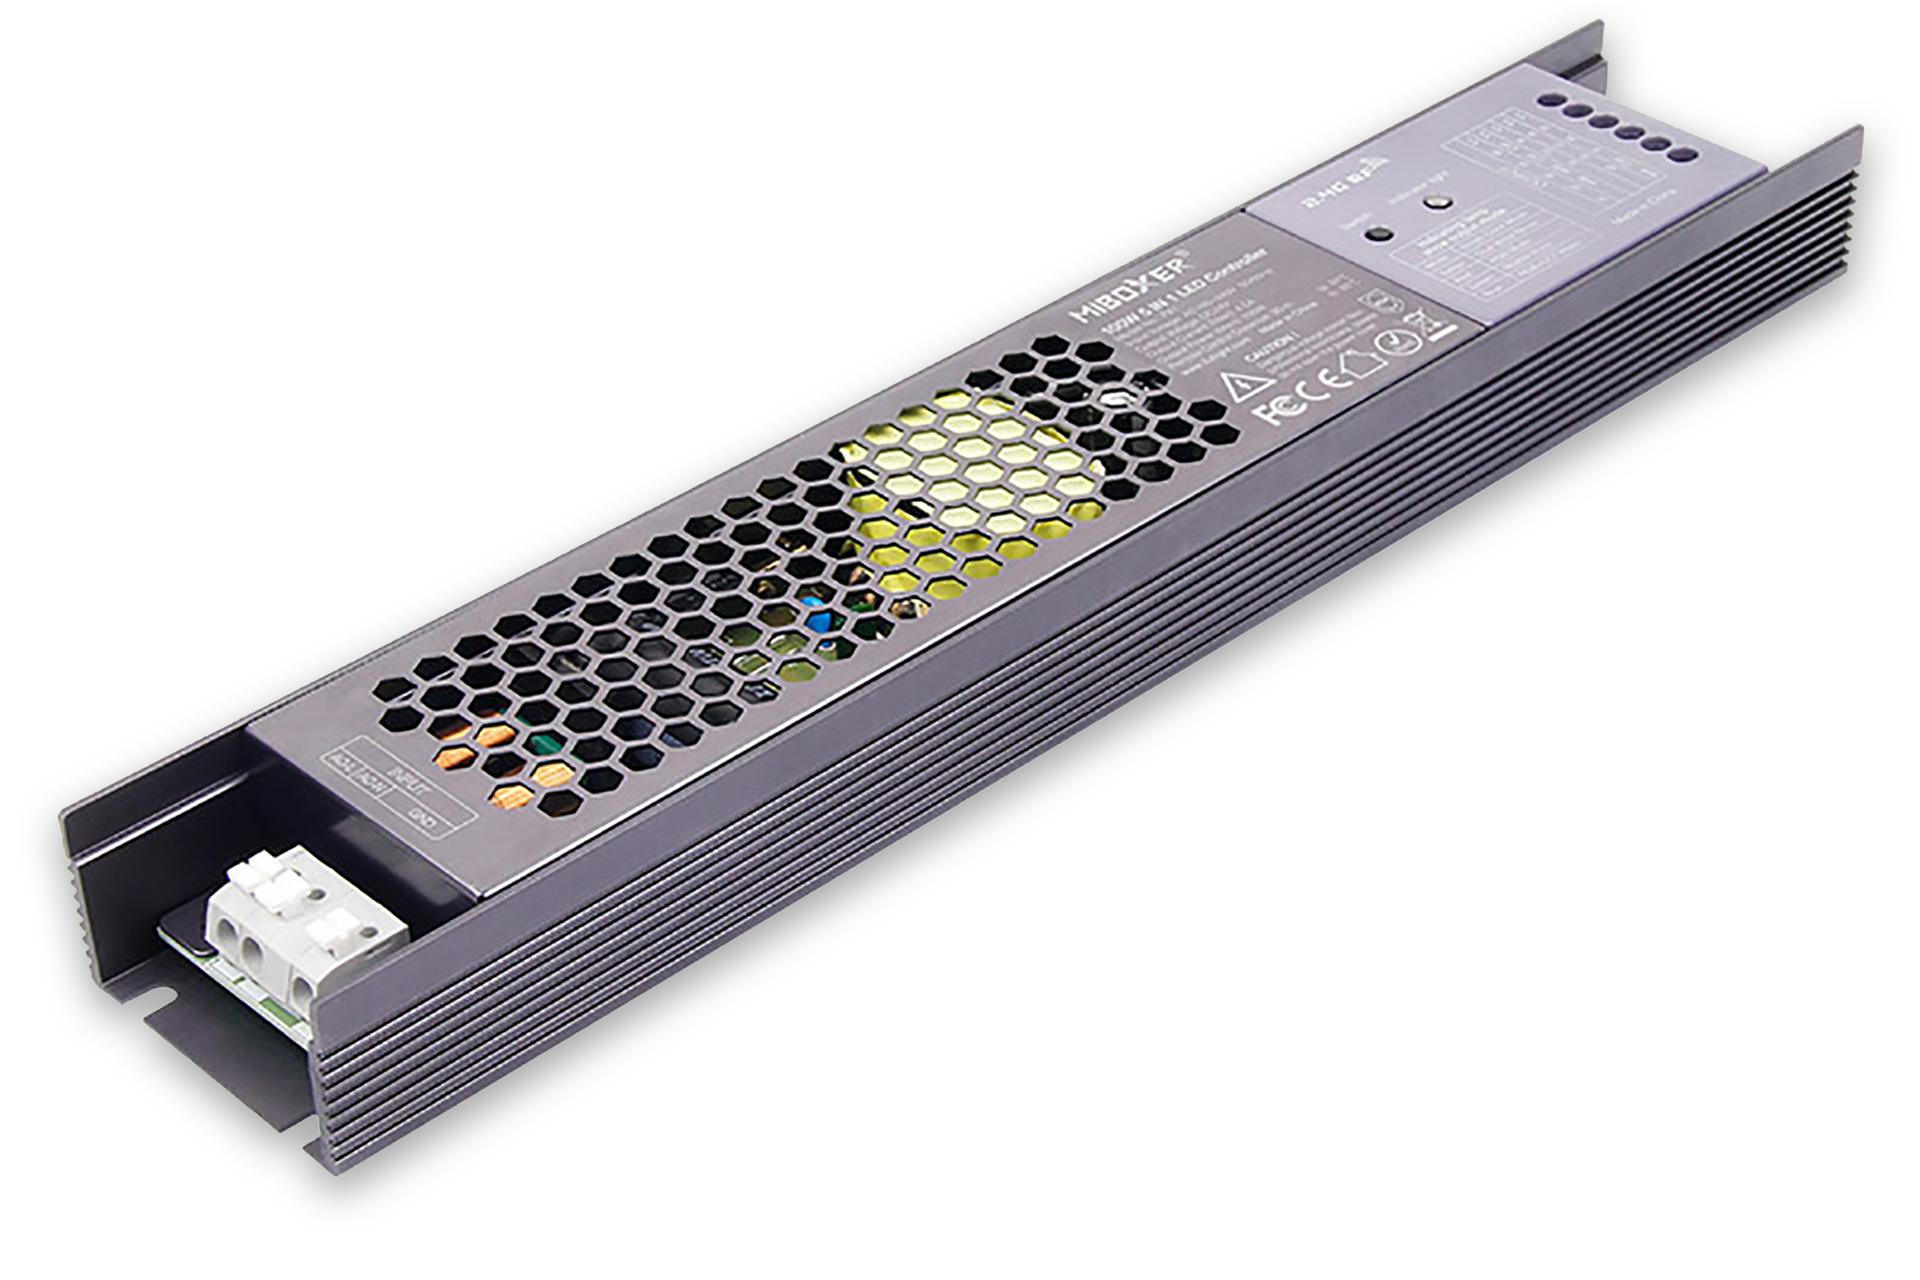 MiLight Miboxer 100W 24Volt Voeding en Controller in  één